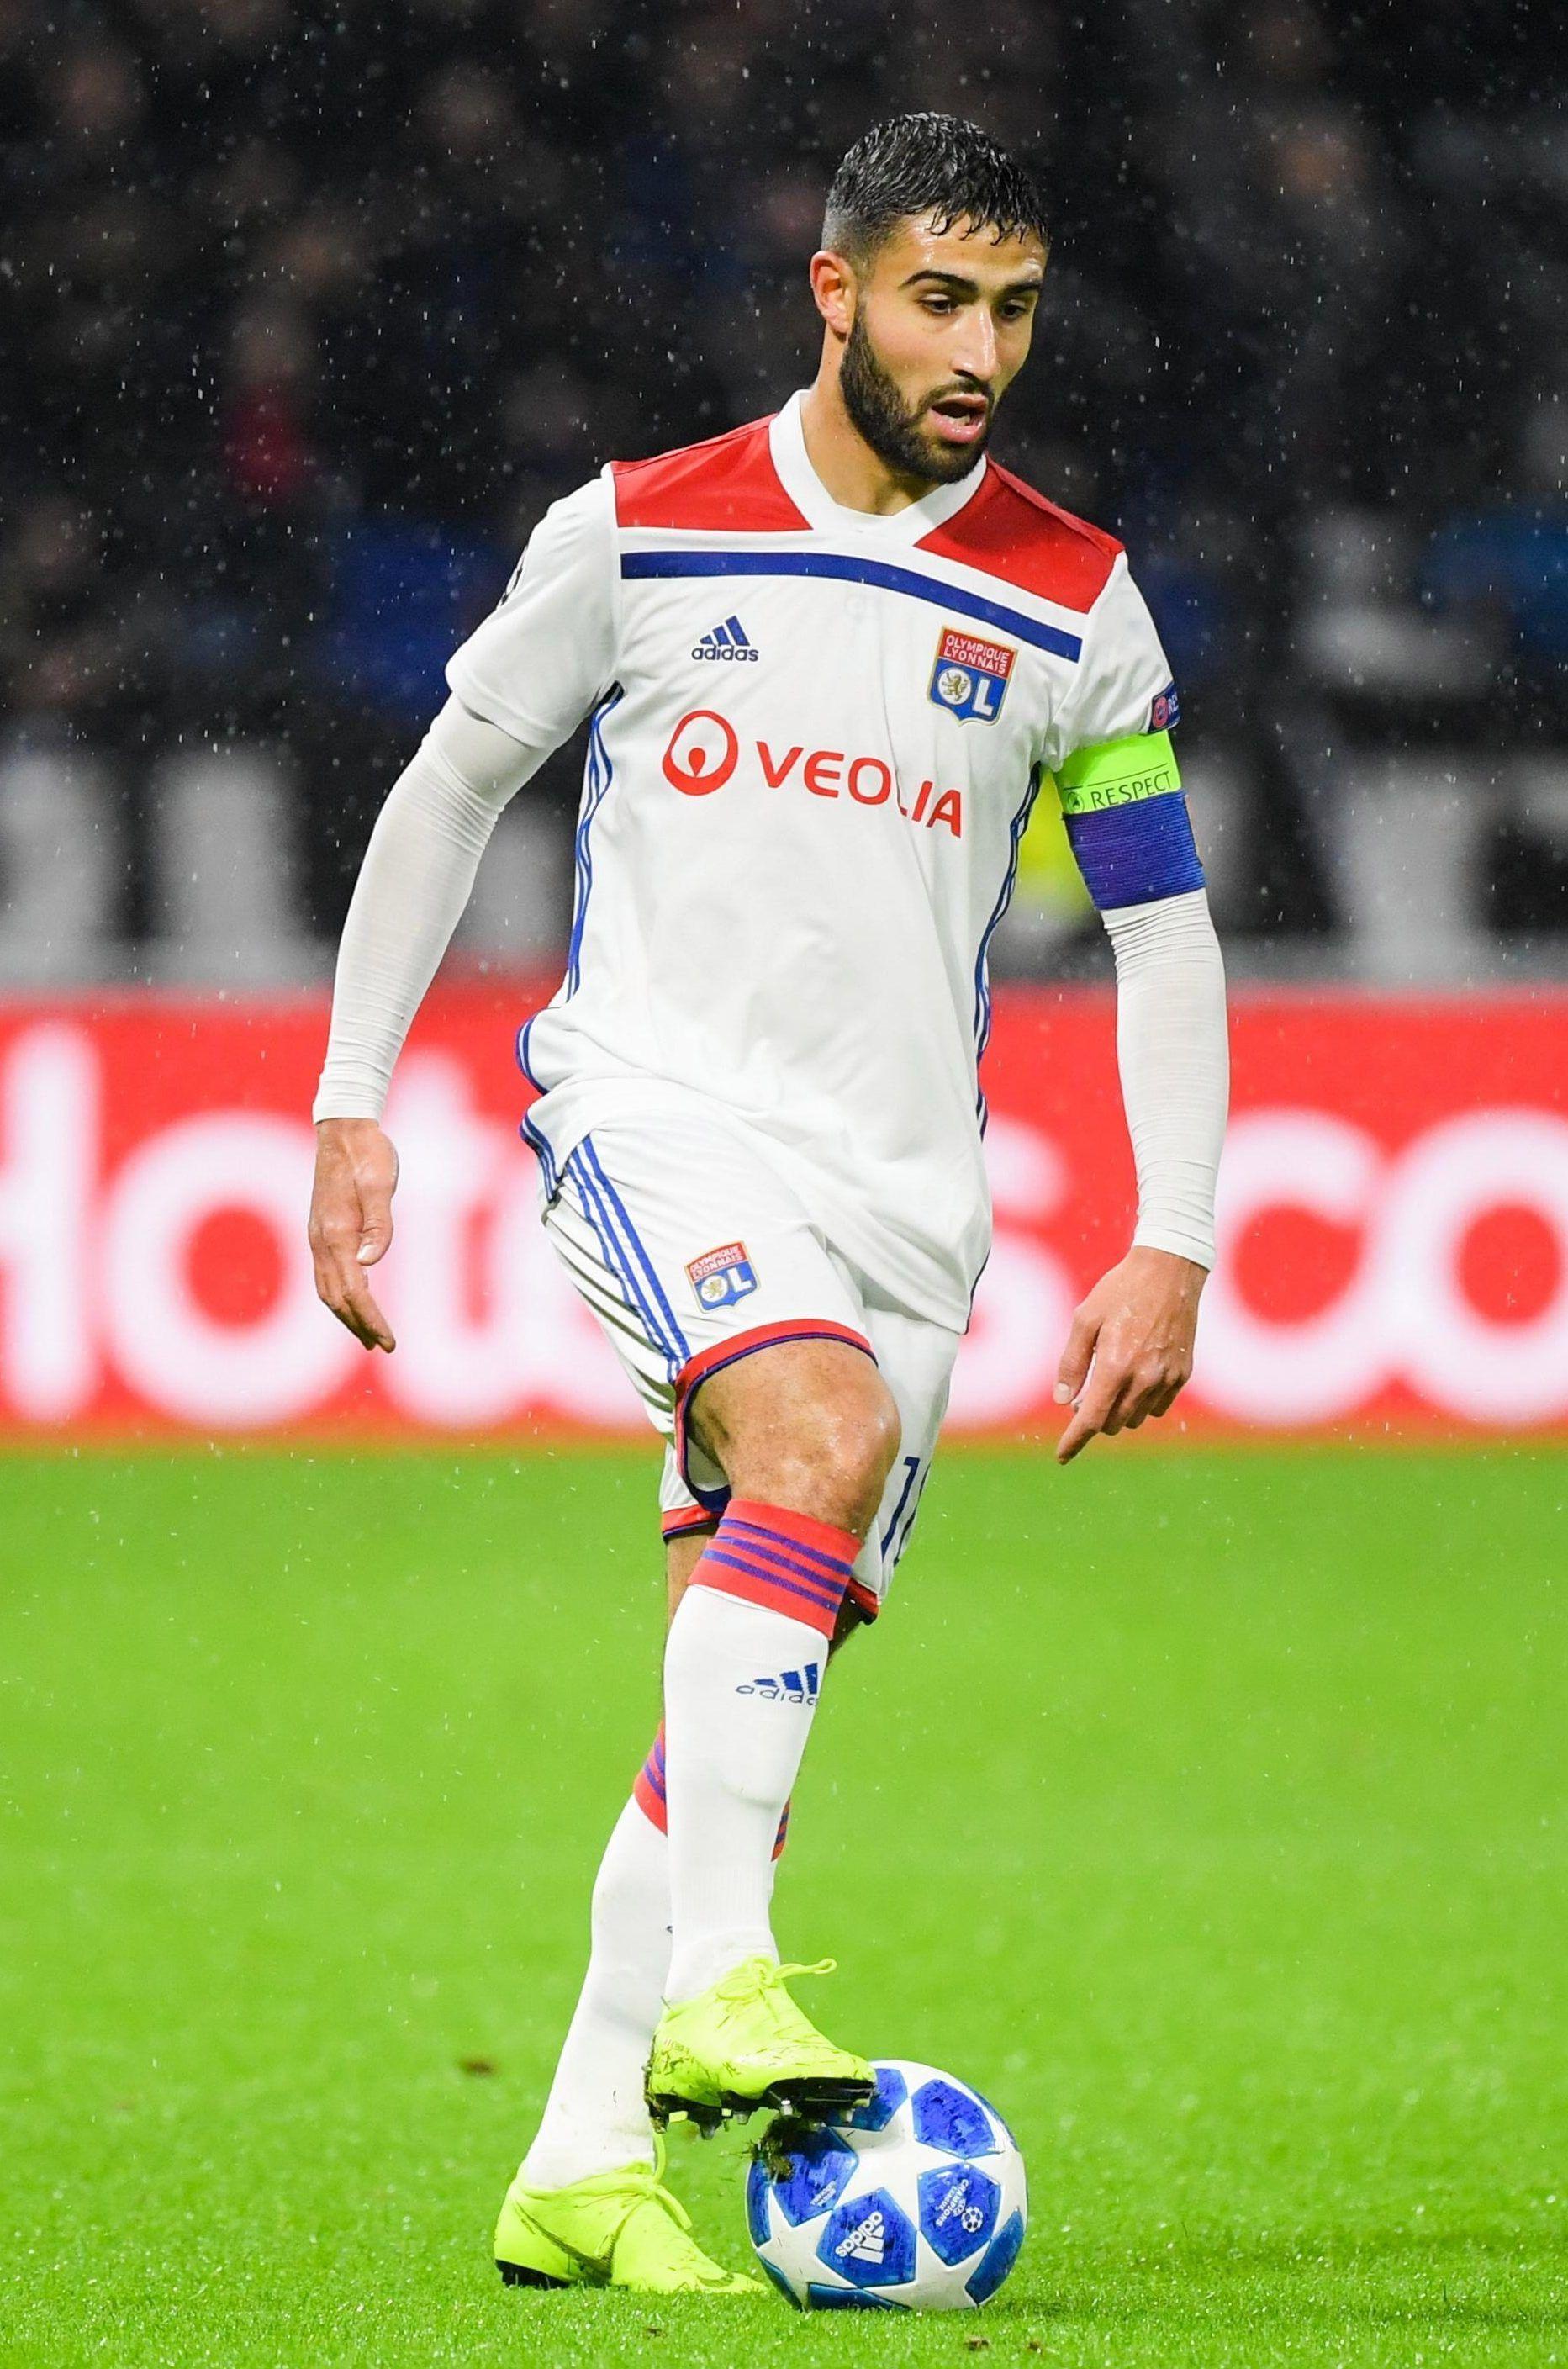 Chelsea Boss Maurizio Sarri Made 50m Transfer Target Nabil Fekir A Promise In A Personal Call To The Exciting Forward Maurizio Sarri Football One Team